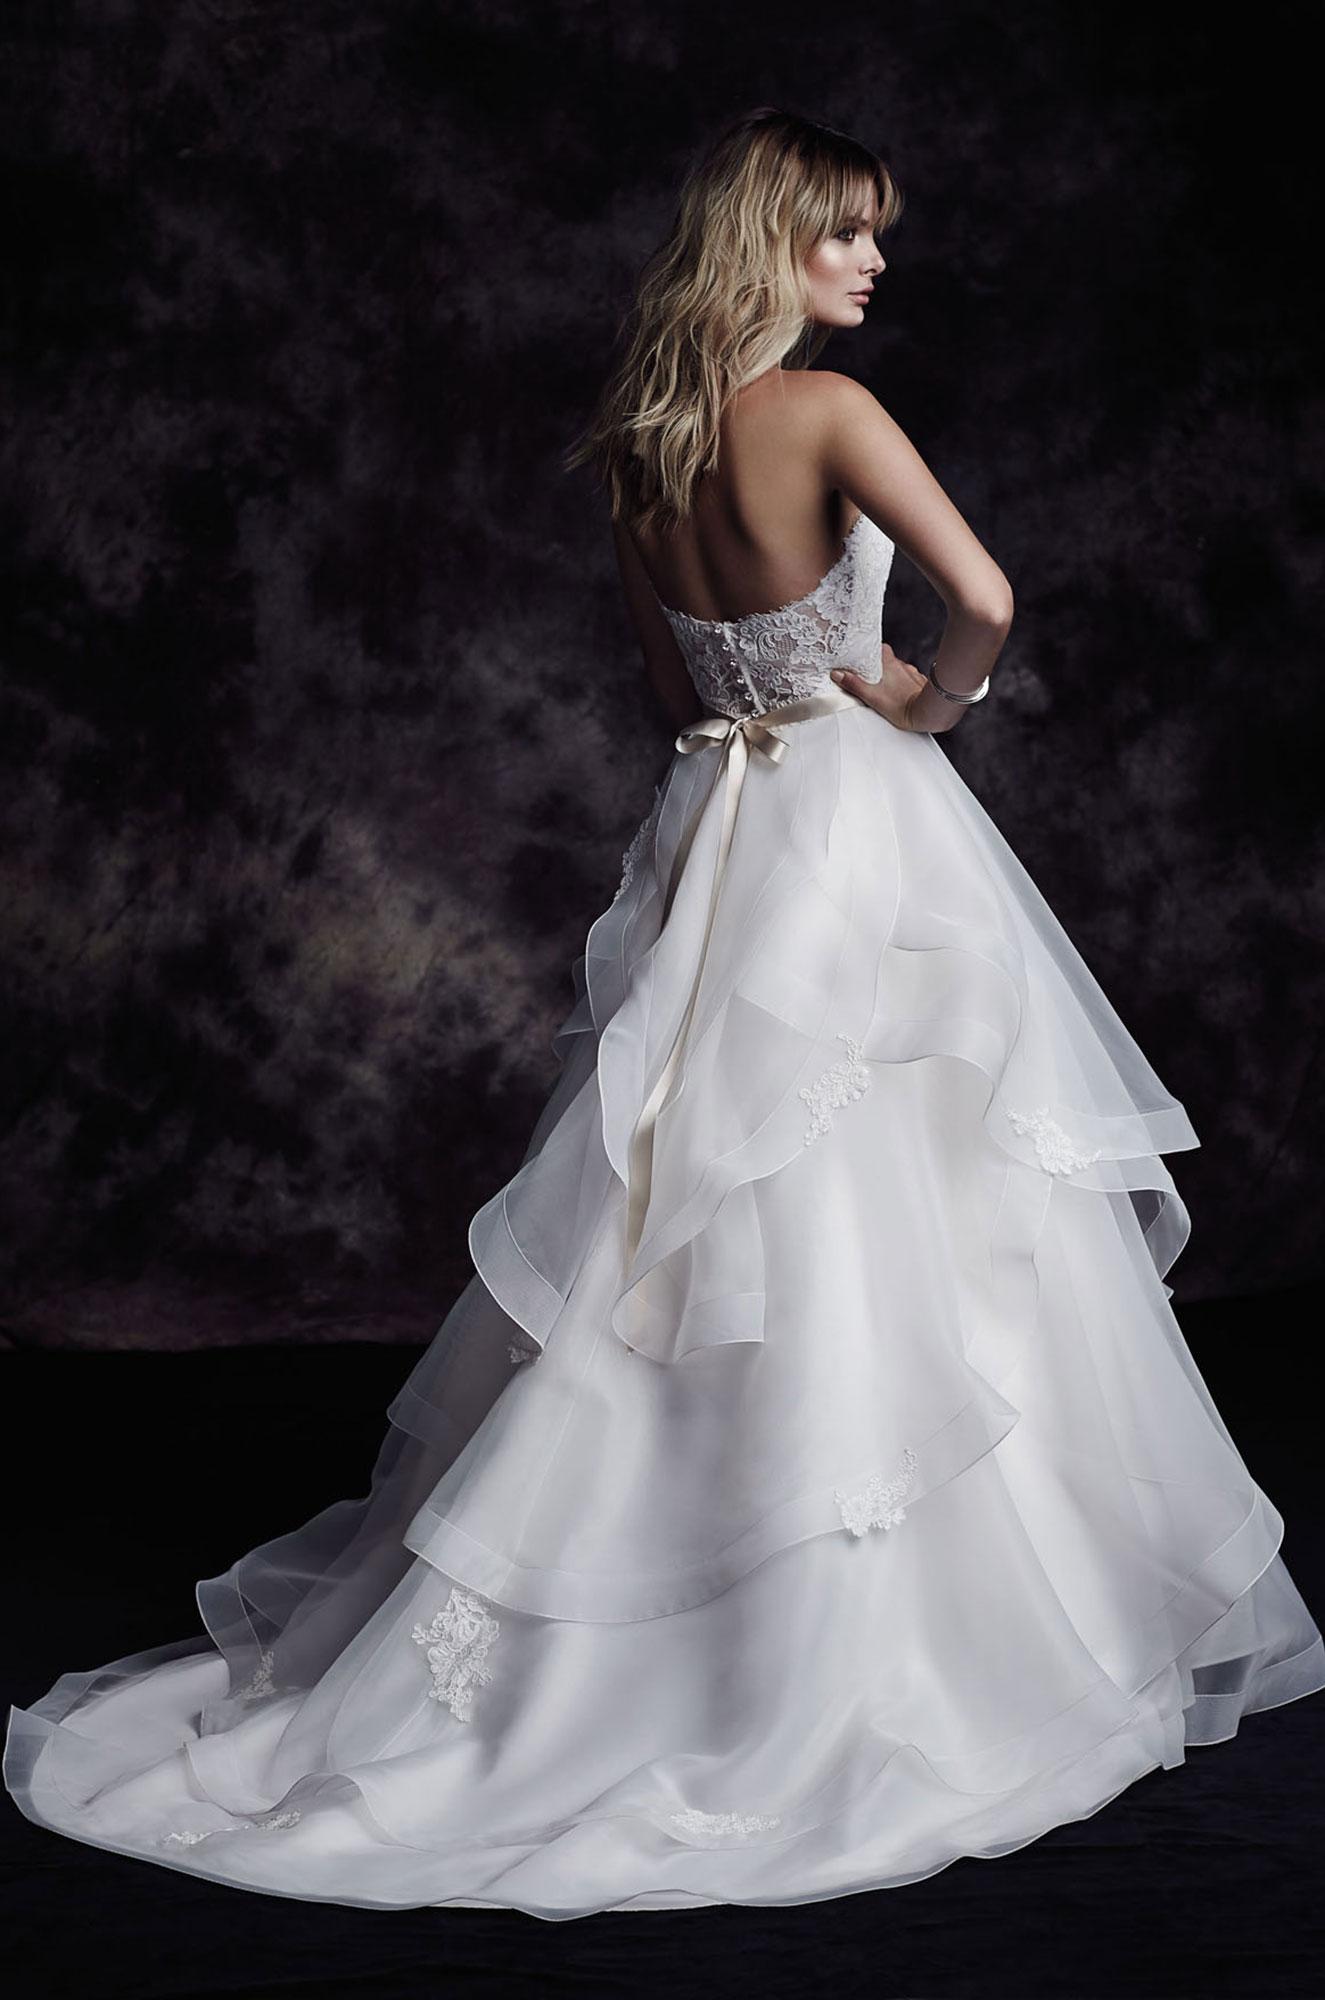 Modest Wedding Dresses Chicago - Carley & Connellan